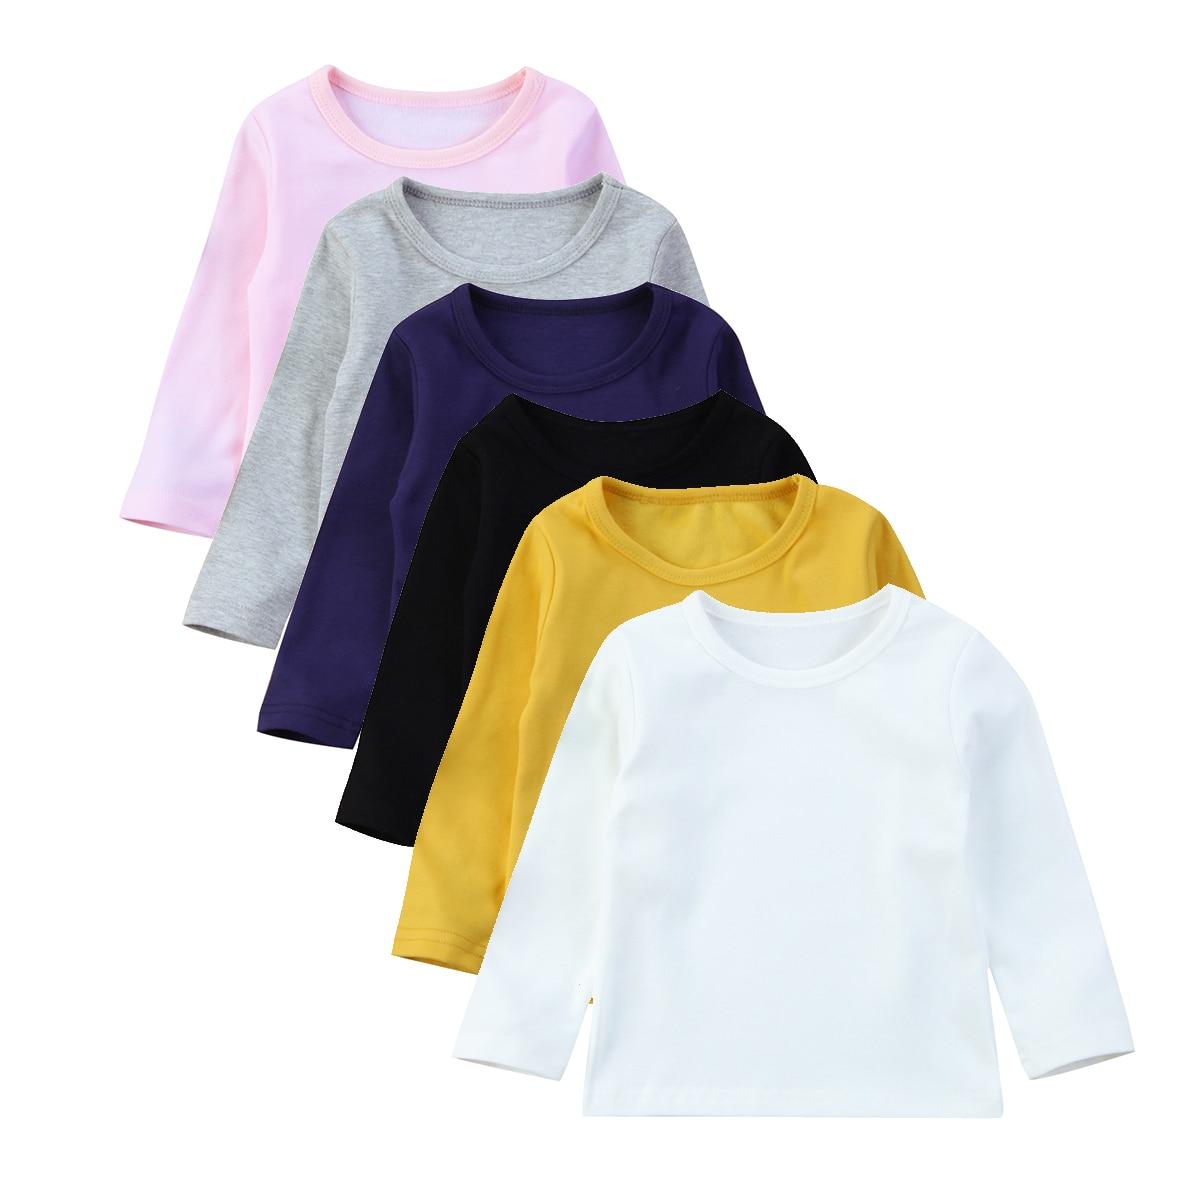 Nike Swoosh V-Neck T-Shirt Men/'s Small Medium Large XL BNWT FAST FREE SHIPPING!